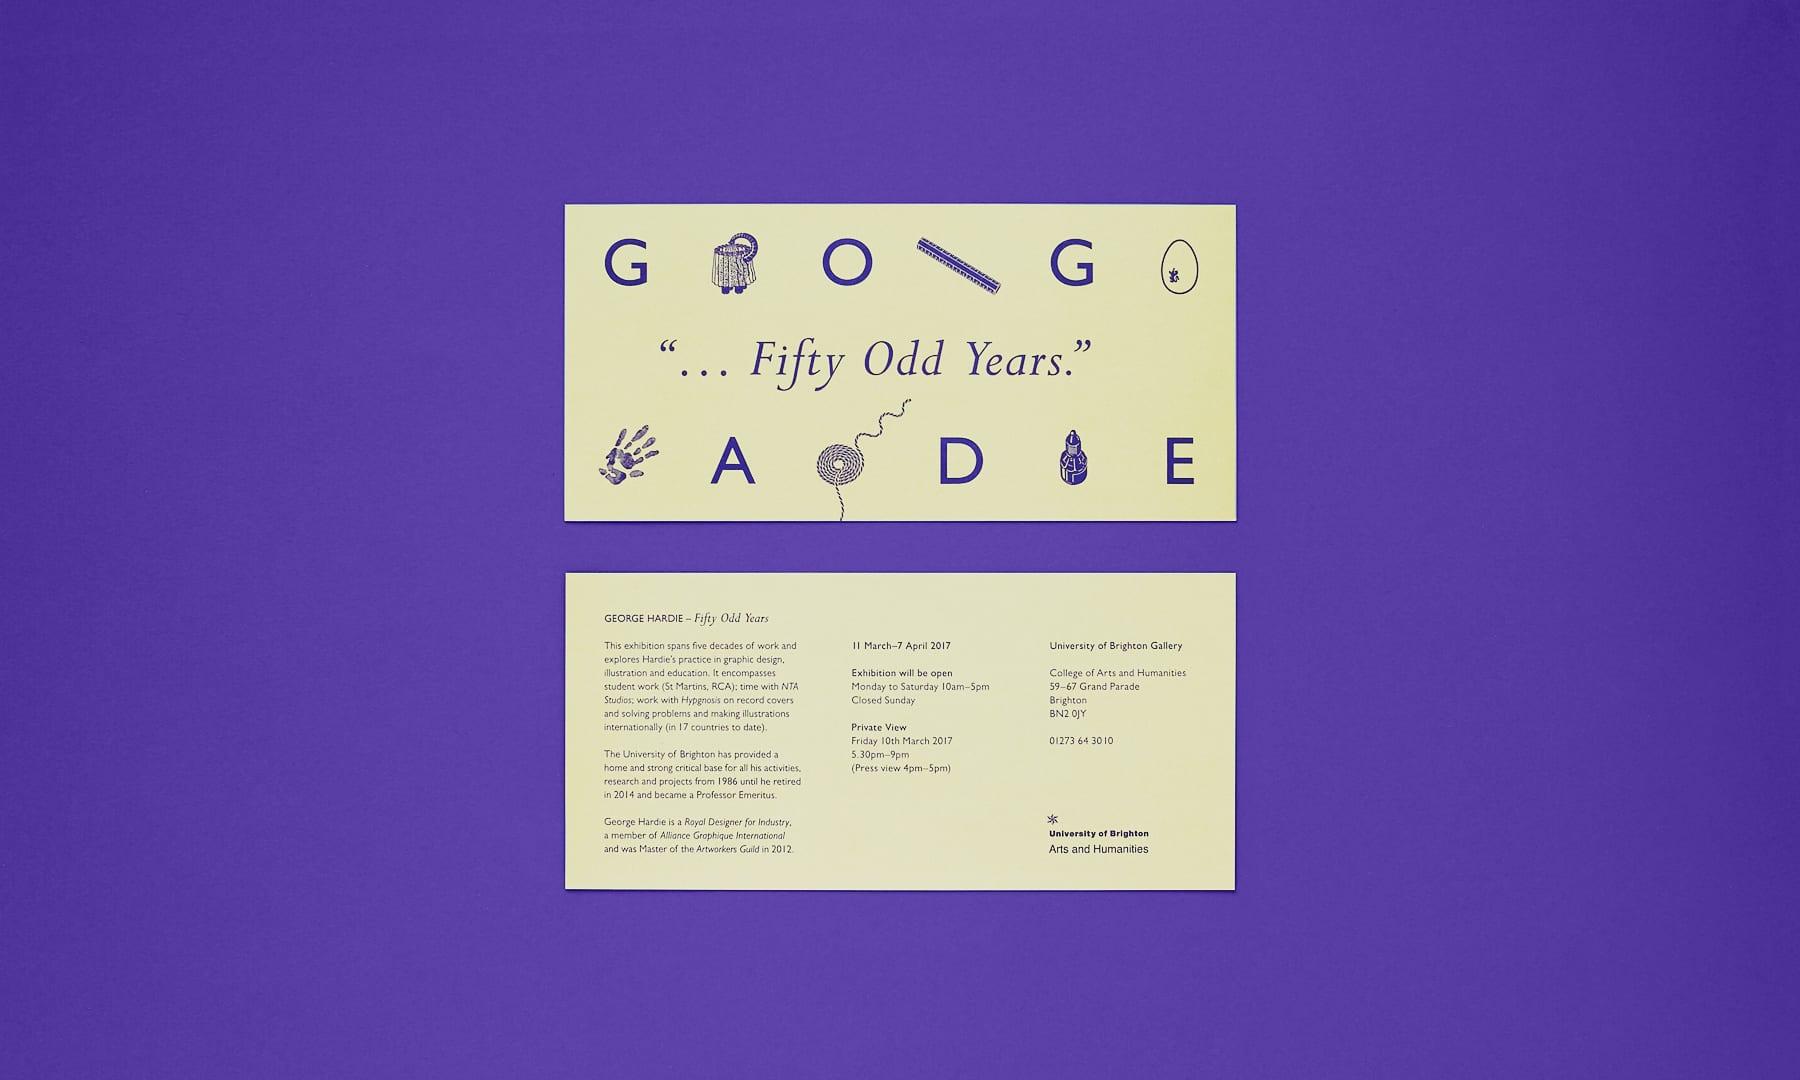 Fifty Odd Years - George Hardie - printed invitation 2